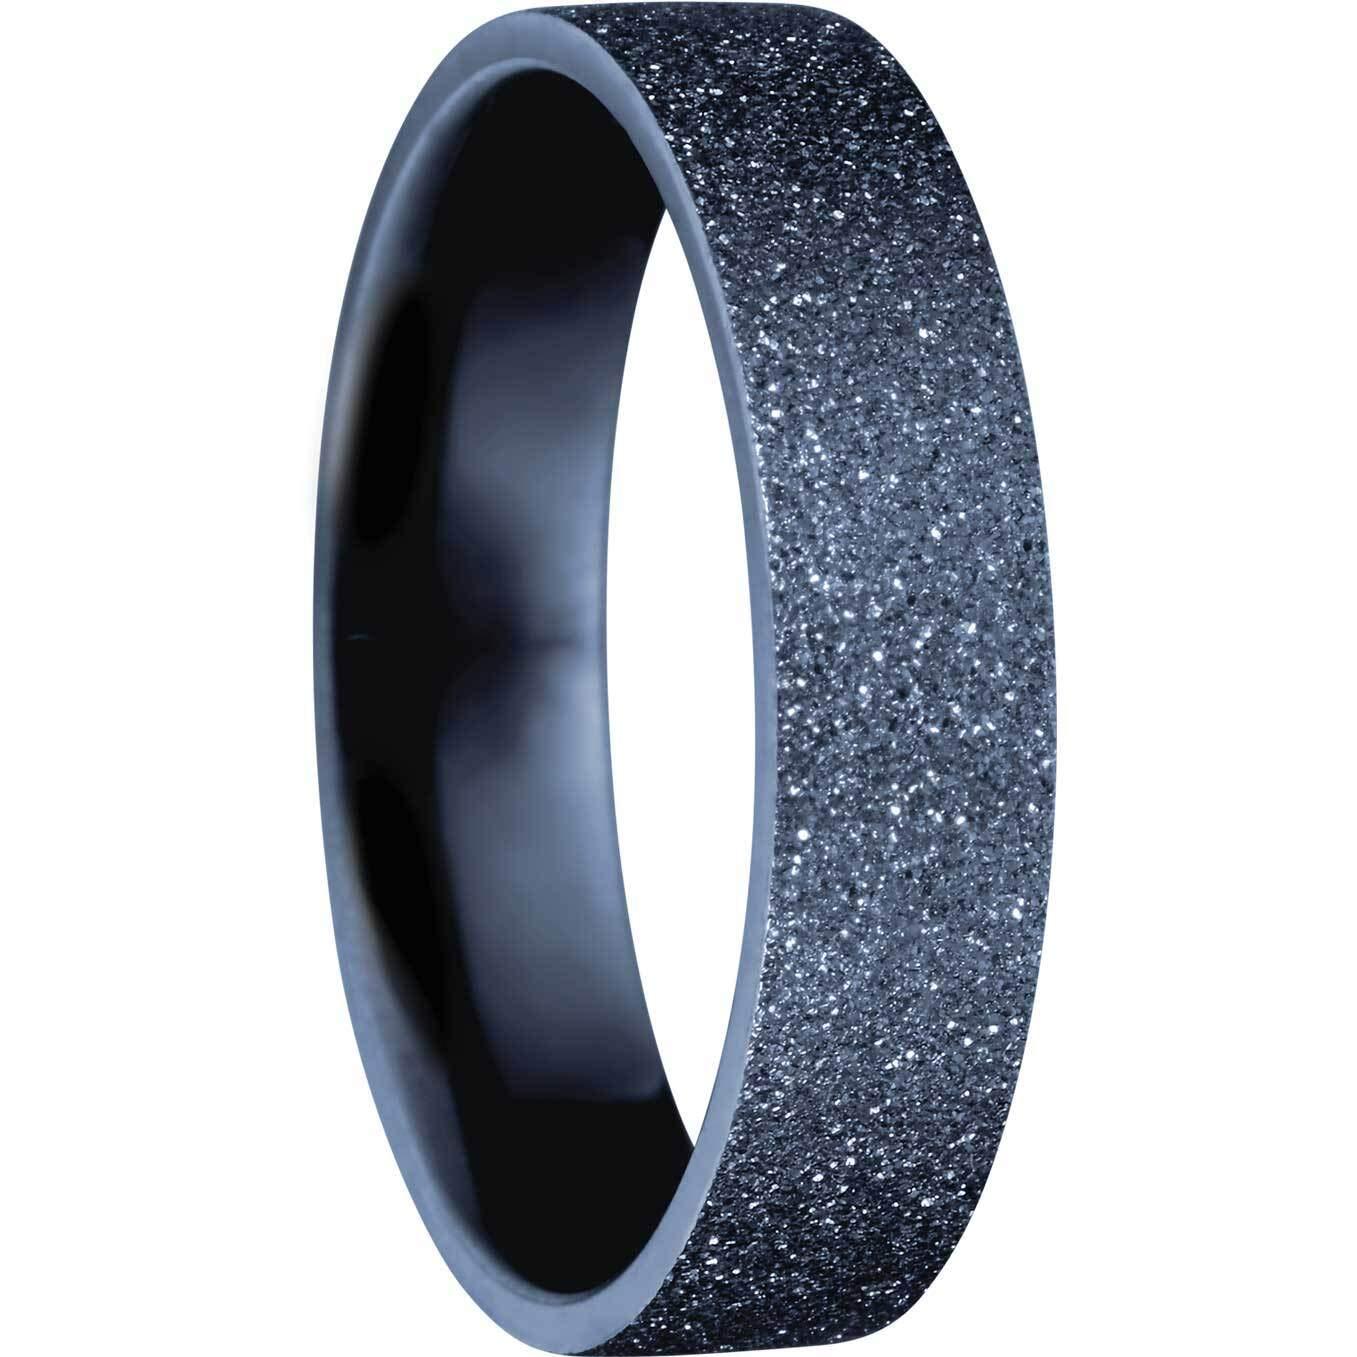 Bering Innenring 557-79-62 Stardust blau breit